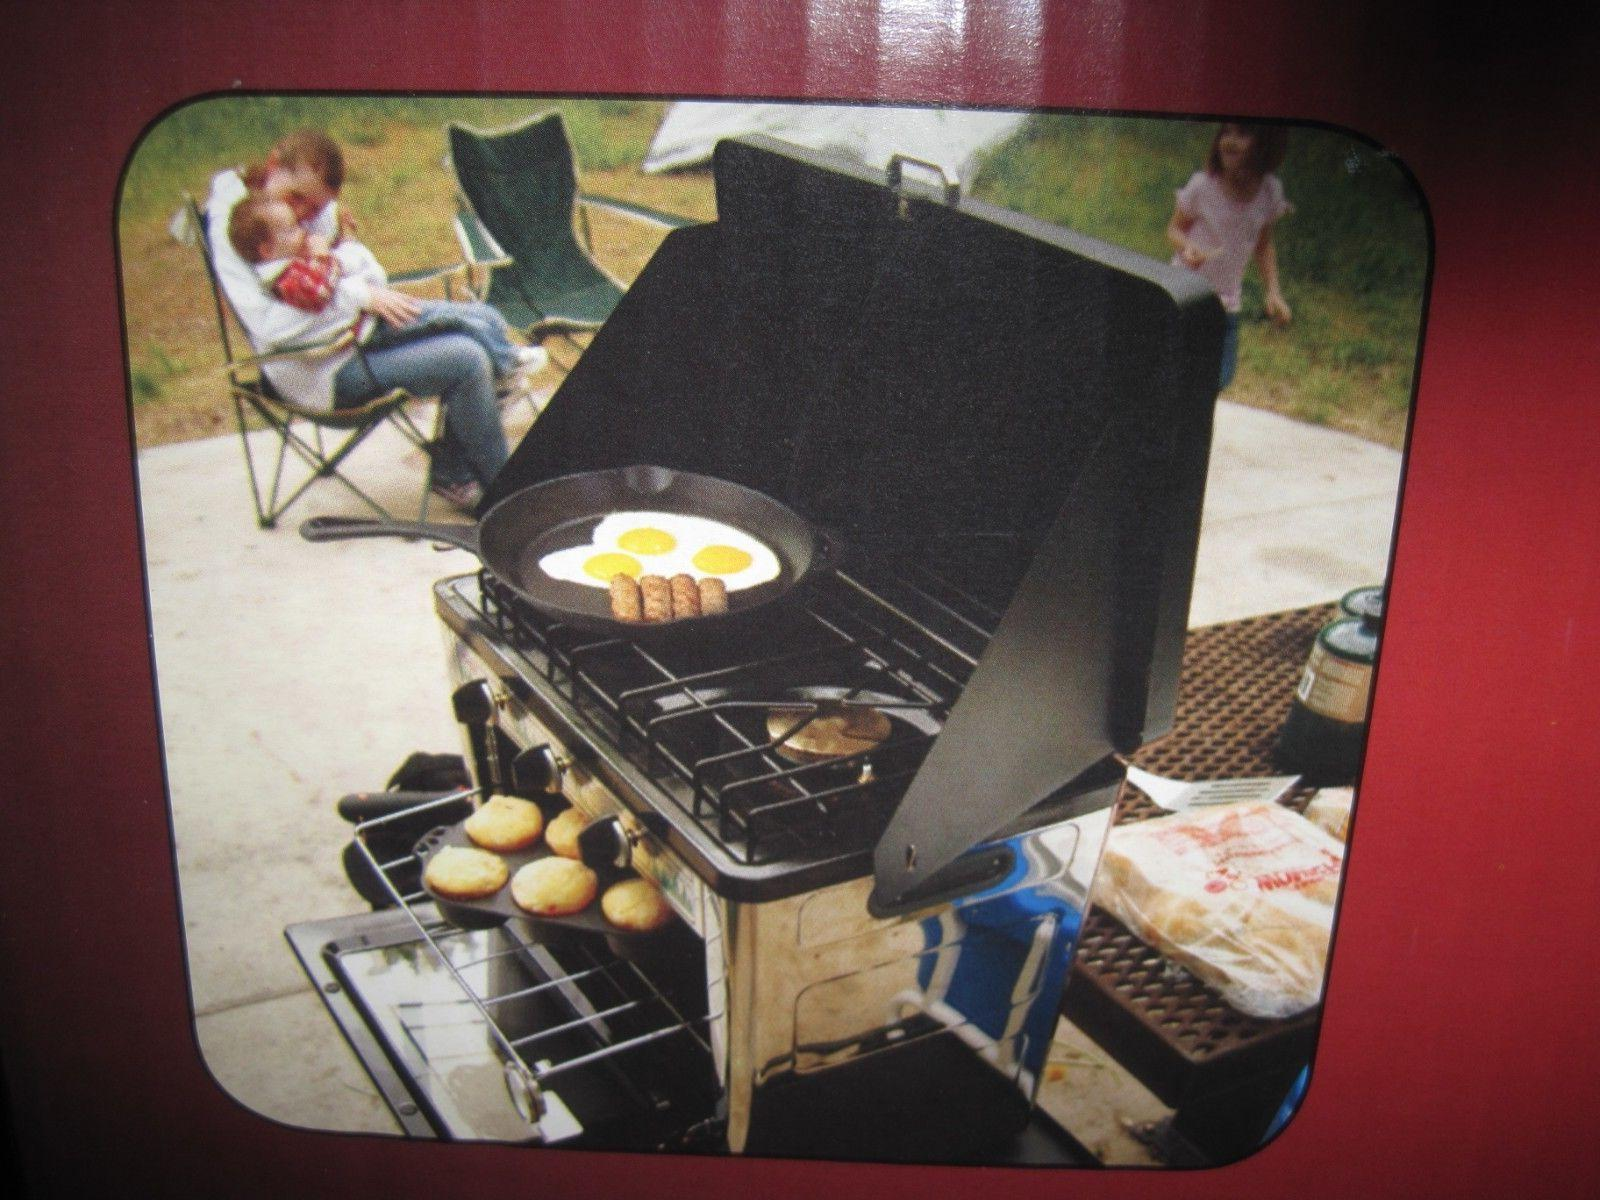 BNIB Outdoor Oven 2 Burner Camping